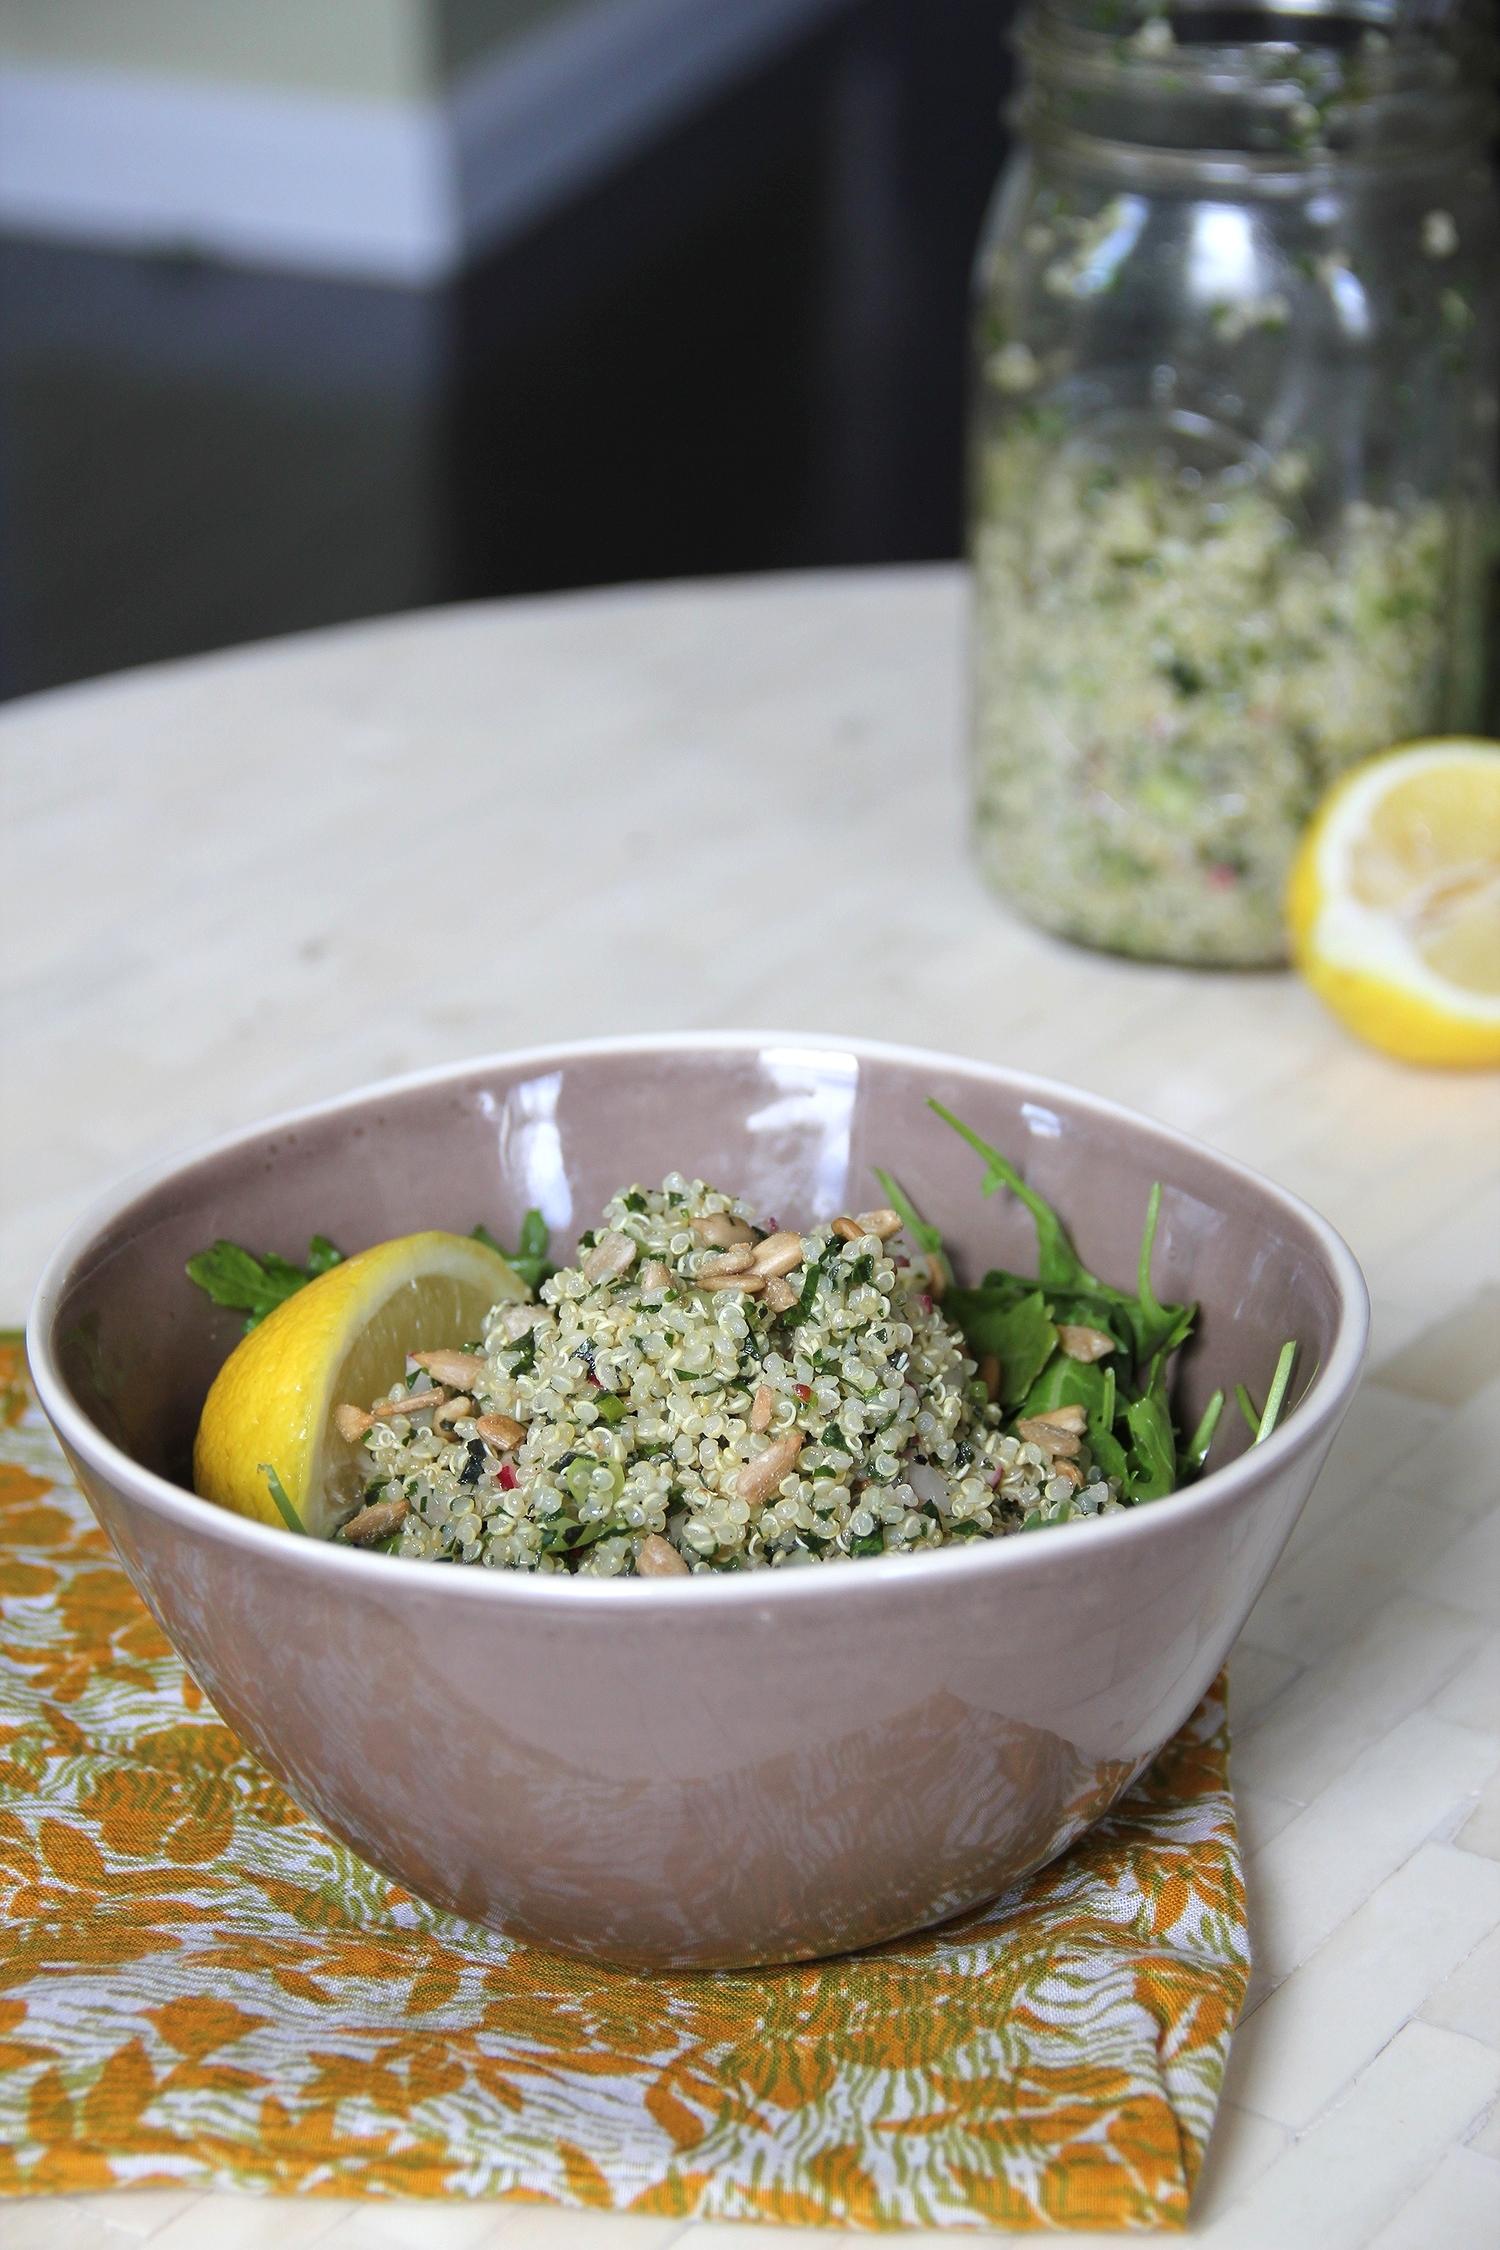 Spring Quinoa Tabouli and Arugula Salad